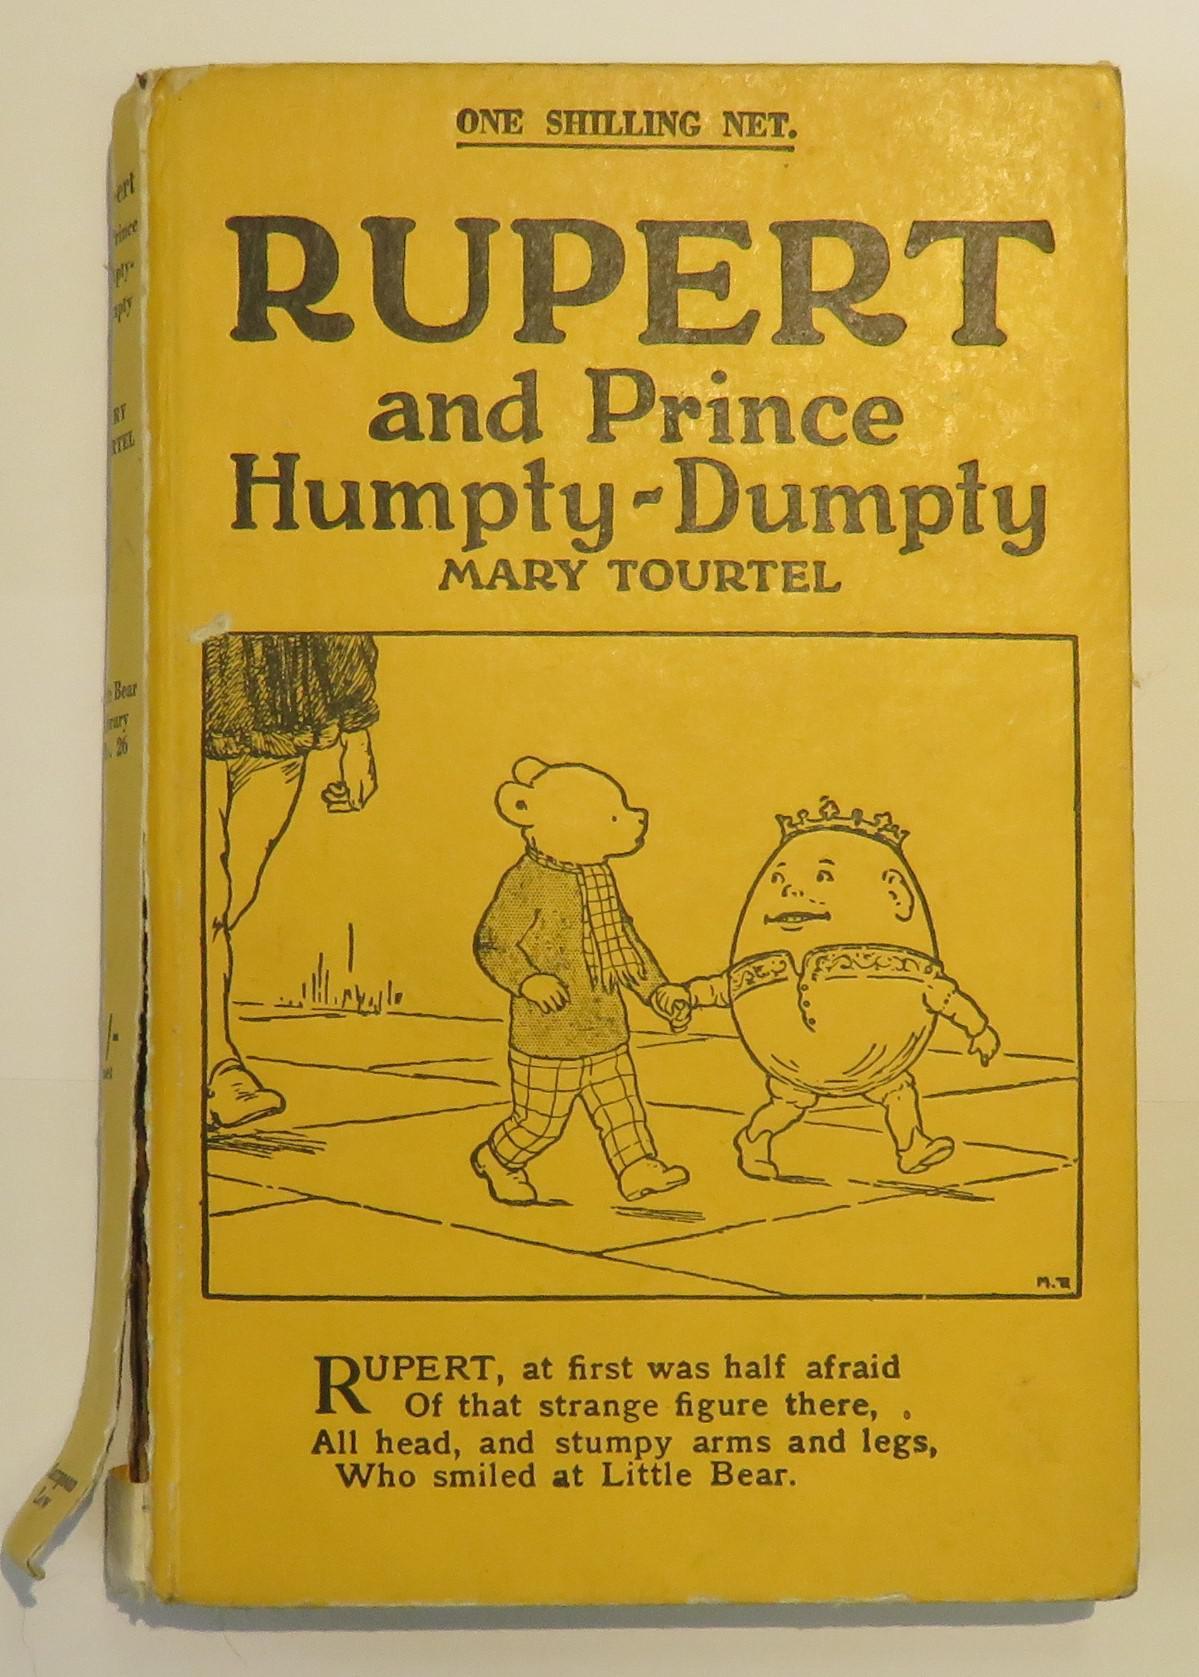 Rupert and Prince Humpty-Dumpty